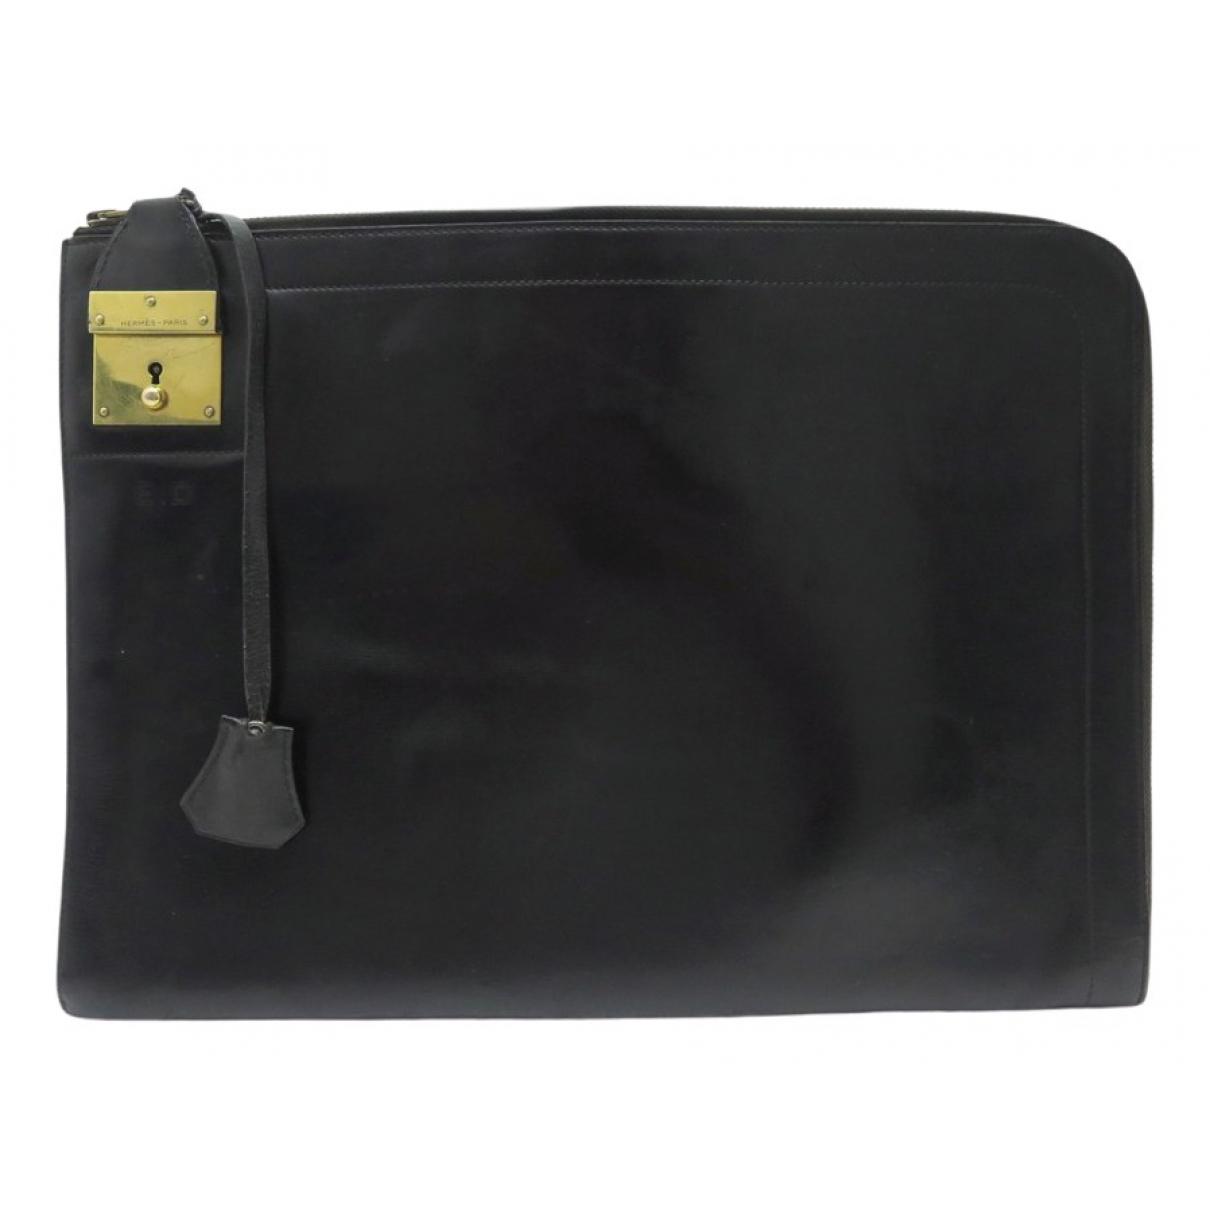 Hermès \N Black Leather Clutch bag for Women \N